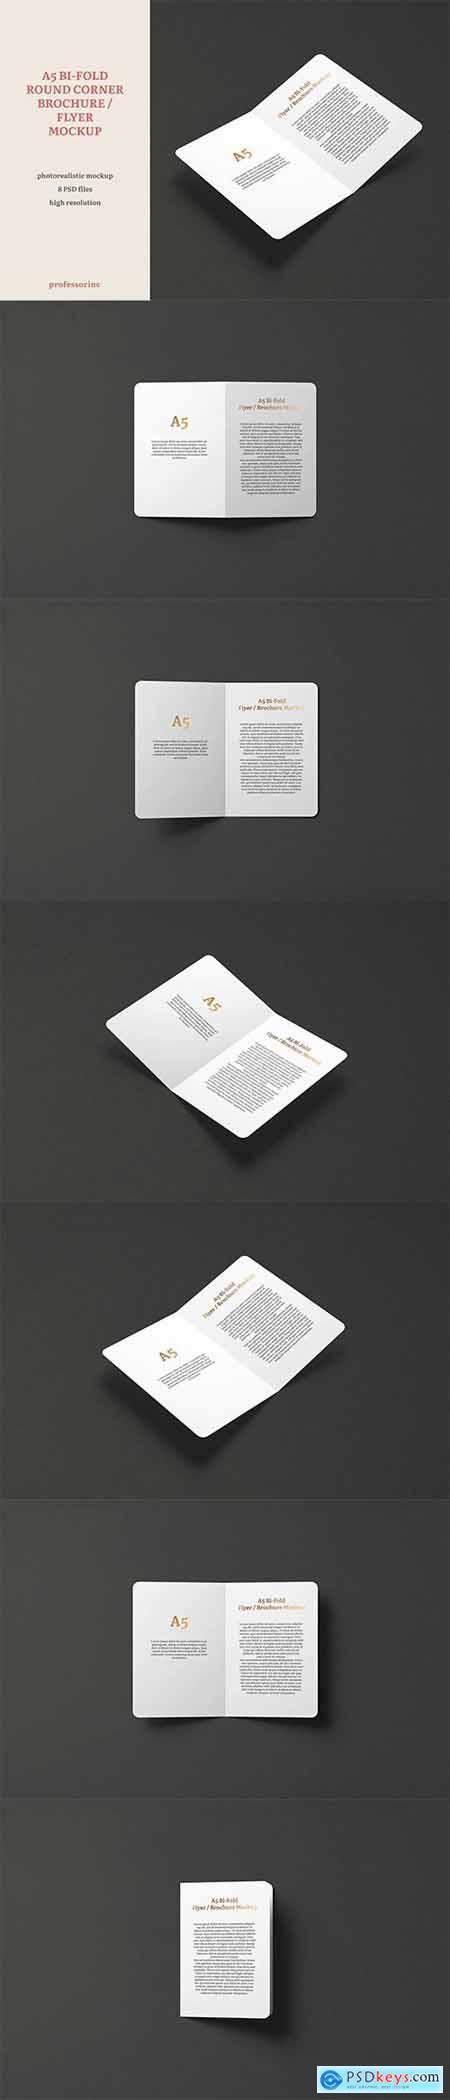 A5 Bi-Fold Round Corner Brochure - Flyer Mockup